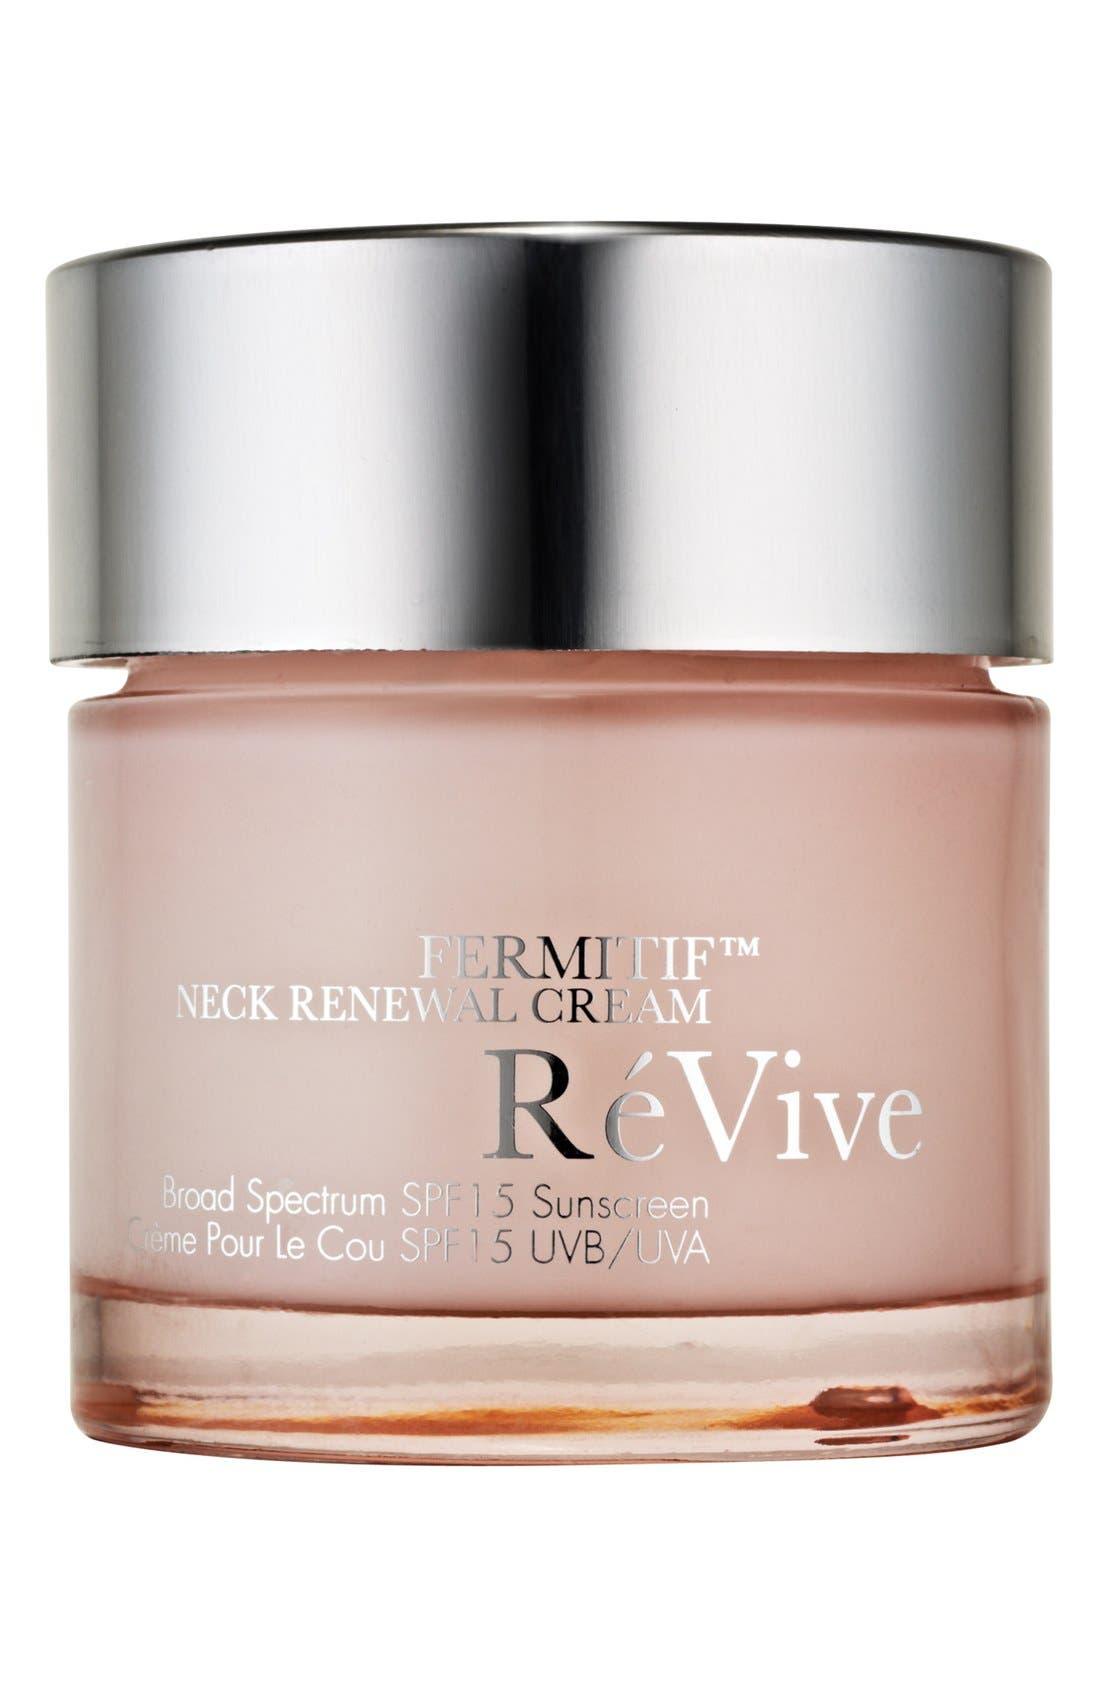 RéVive® Fermitif™ Neck Renewal Cream